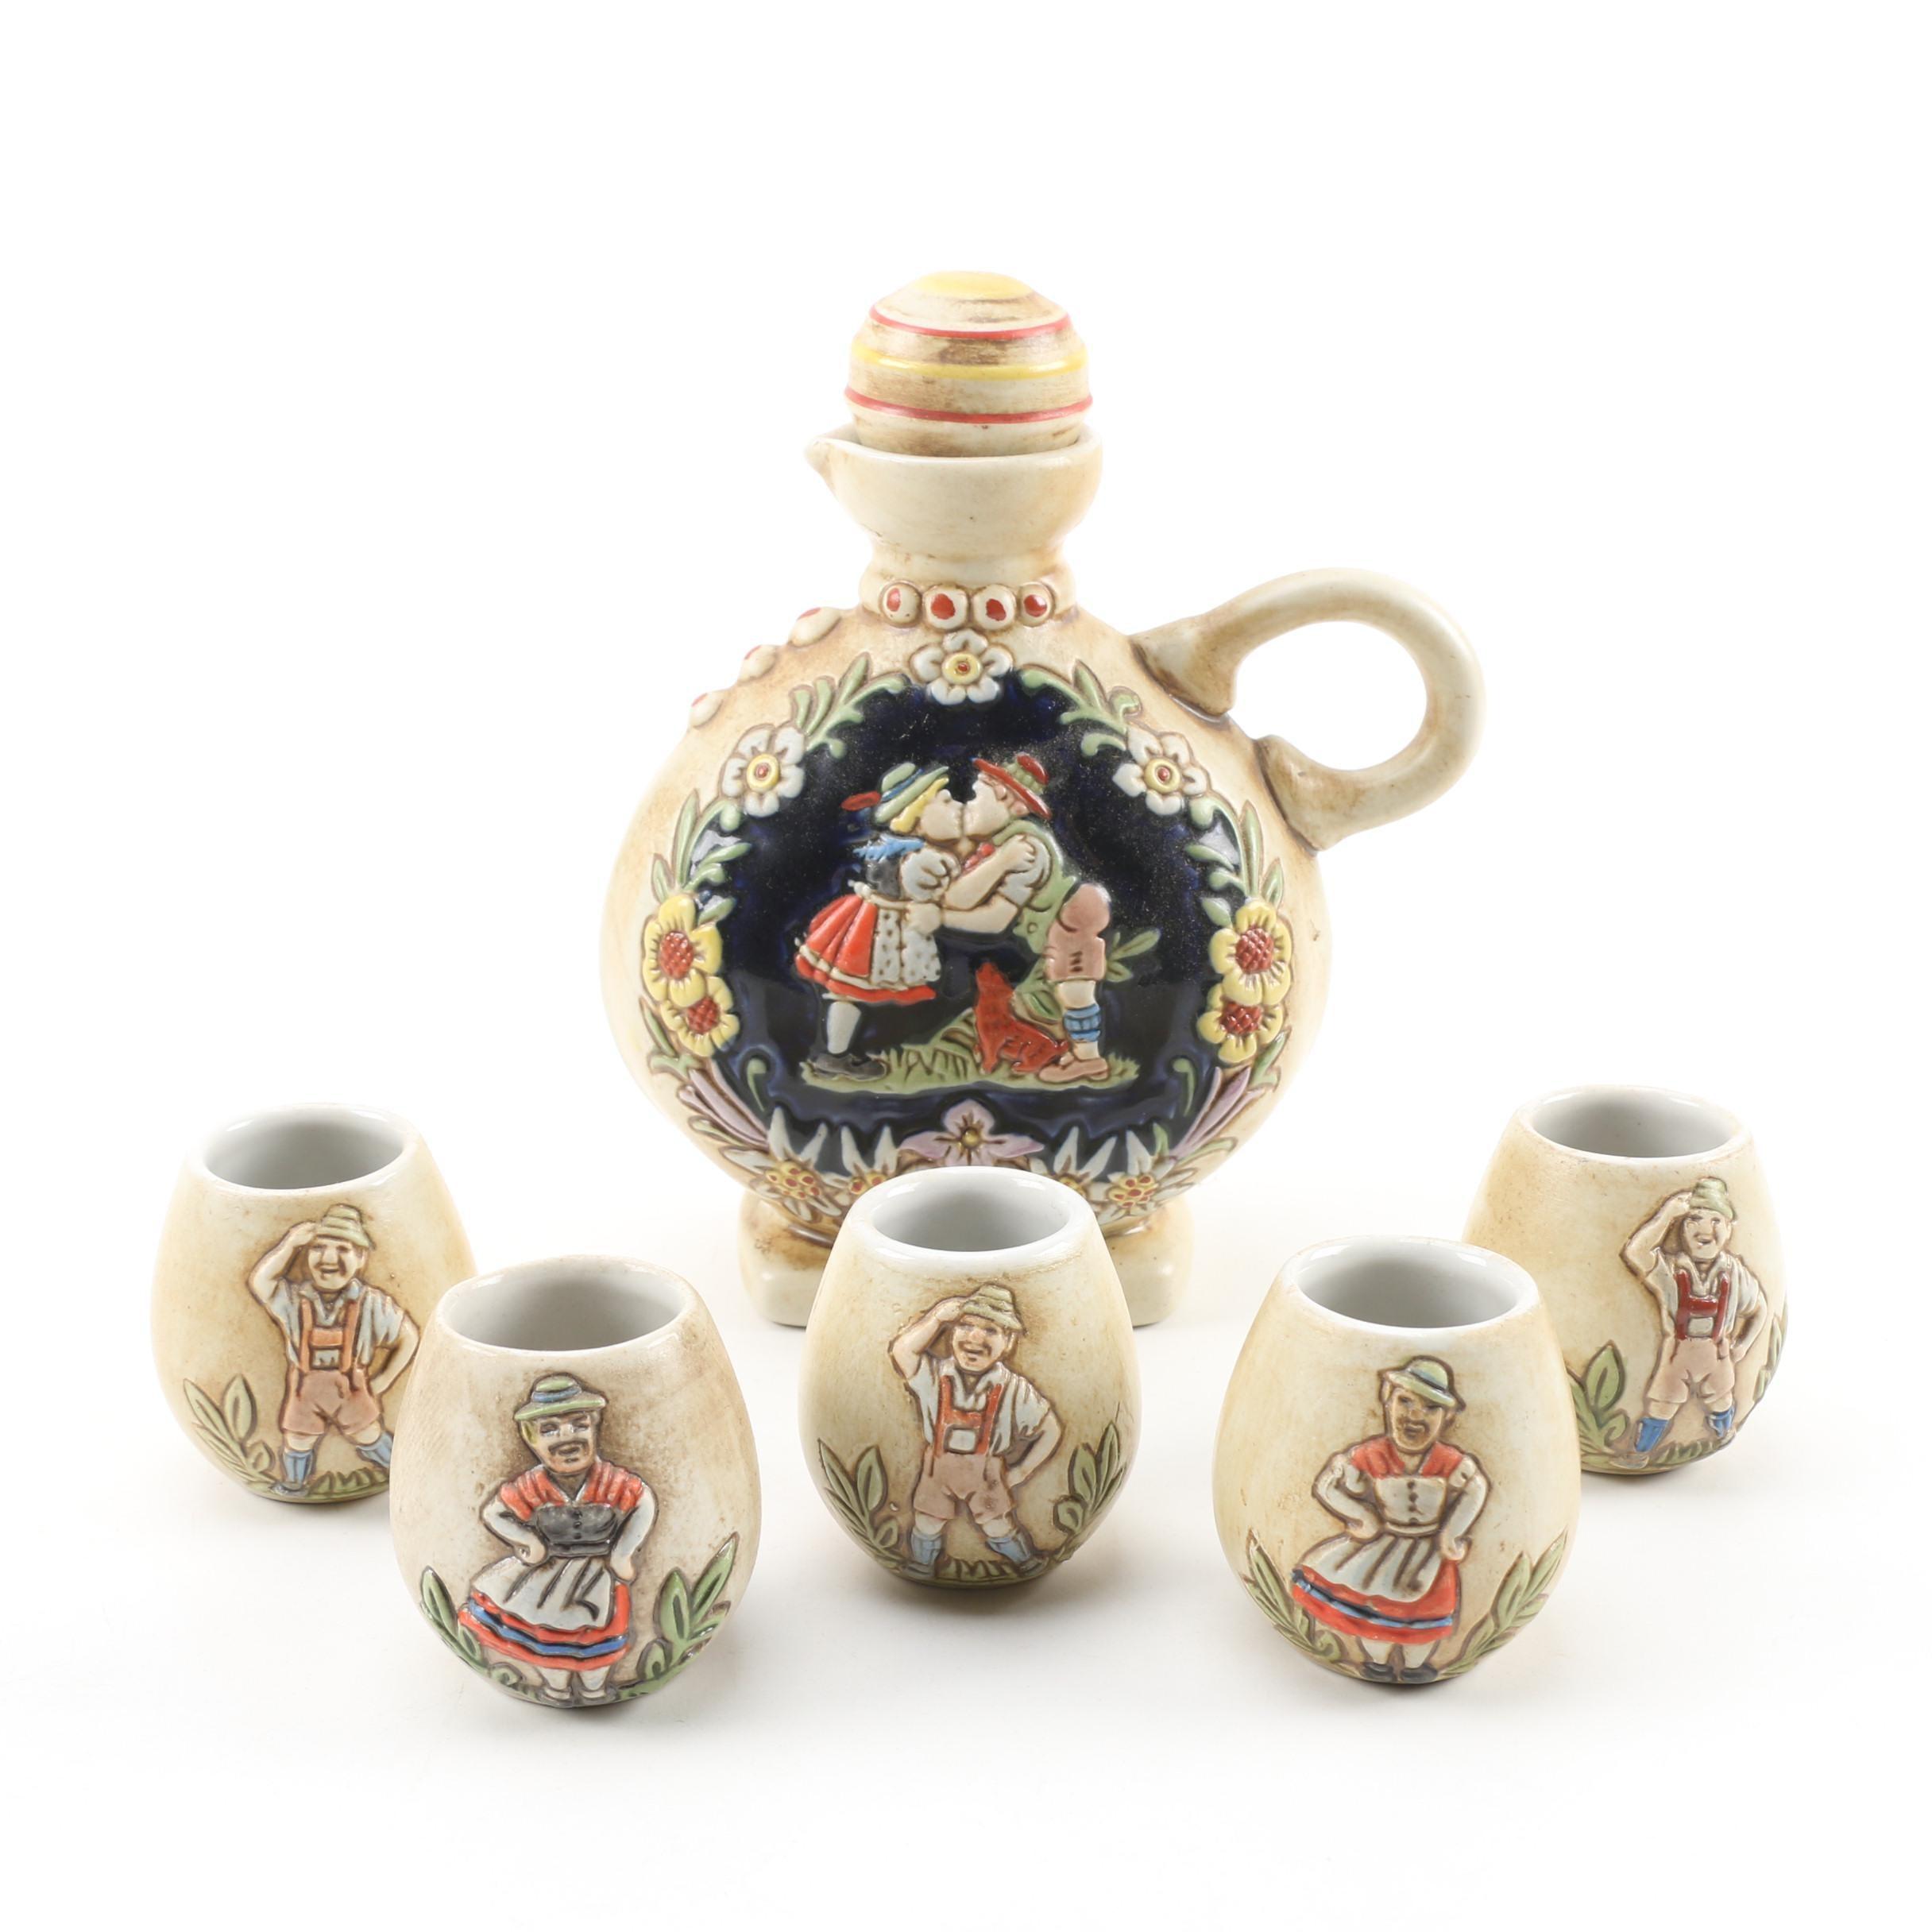 Embossed Ceramarte Decanter and Cups